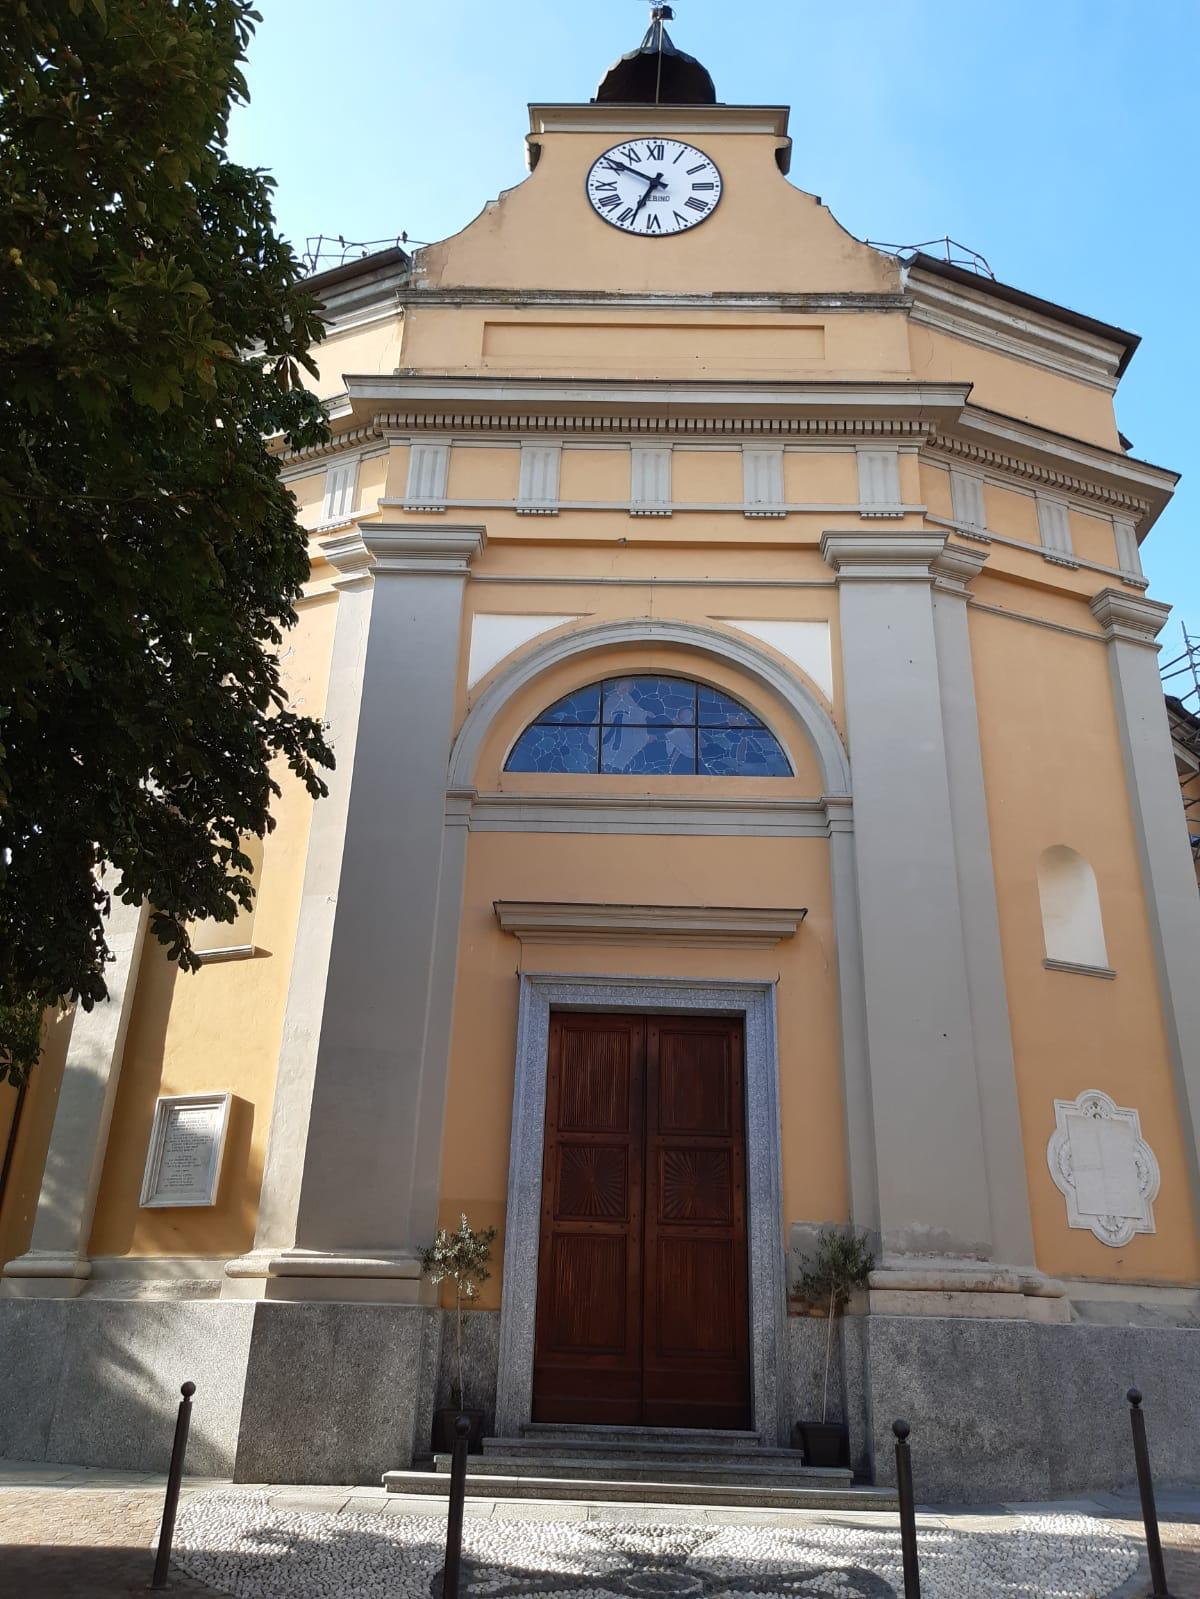 chiesa-parrocchiale-dell-assunta_74312